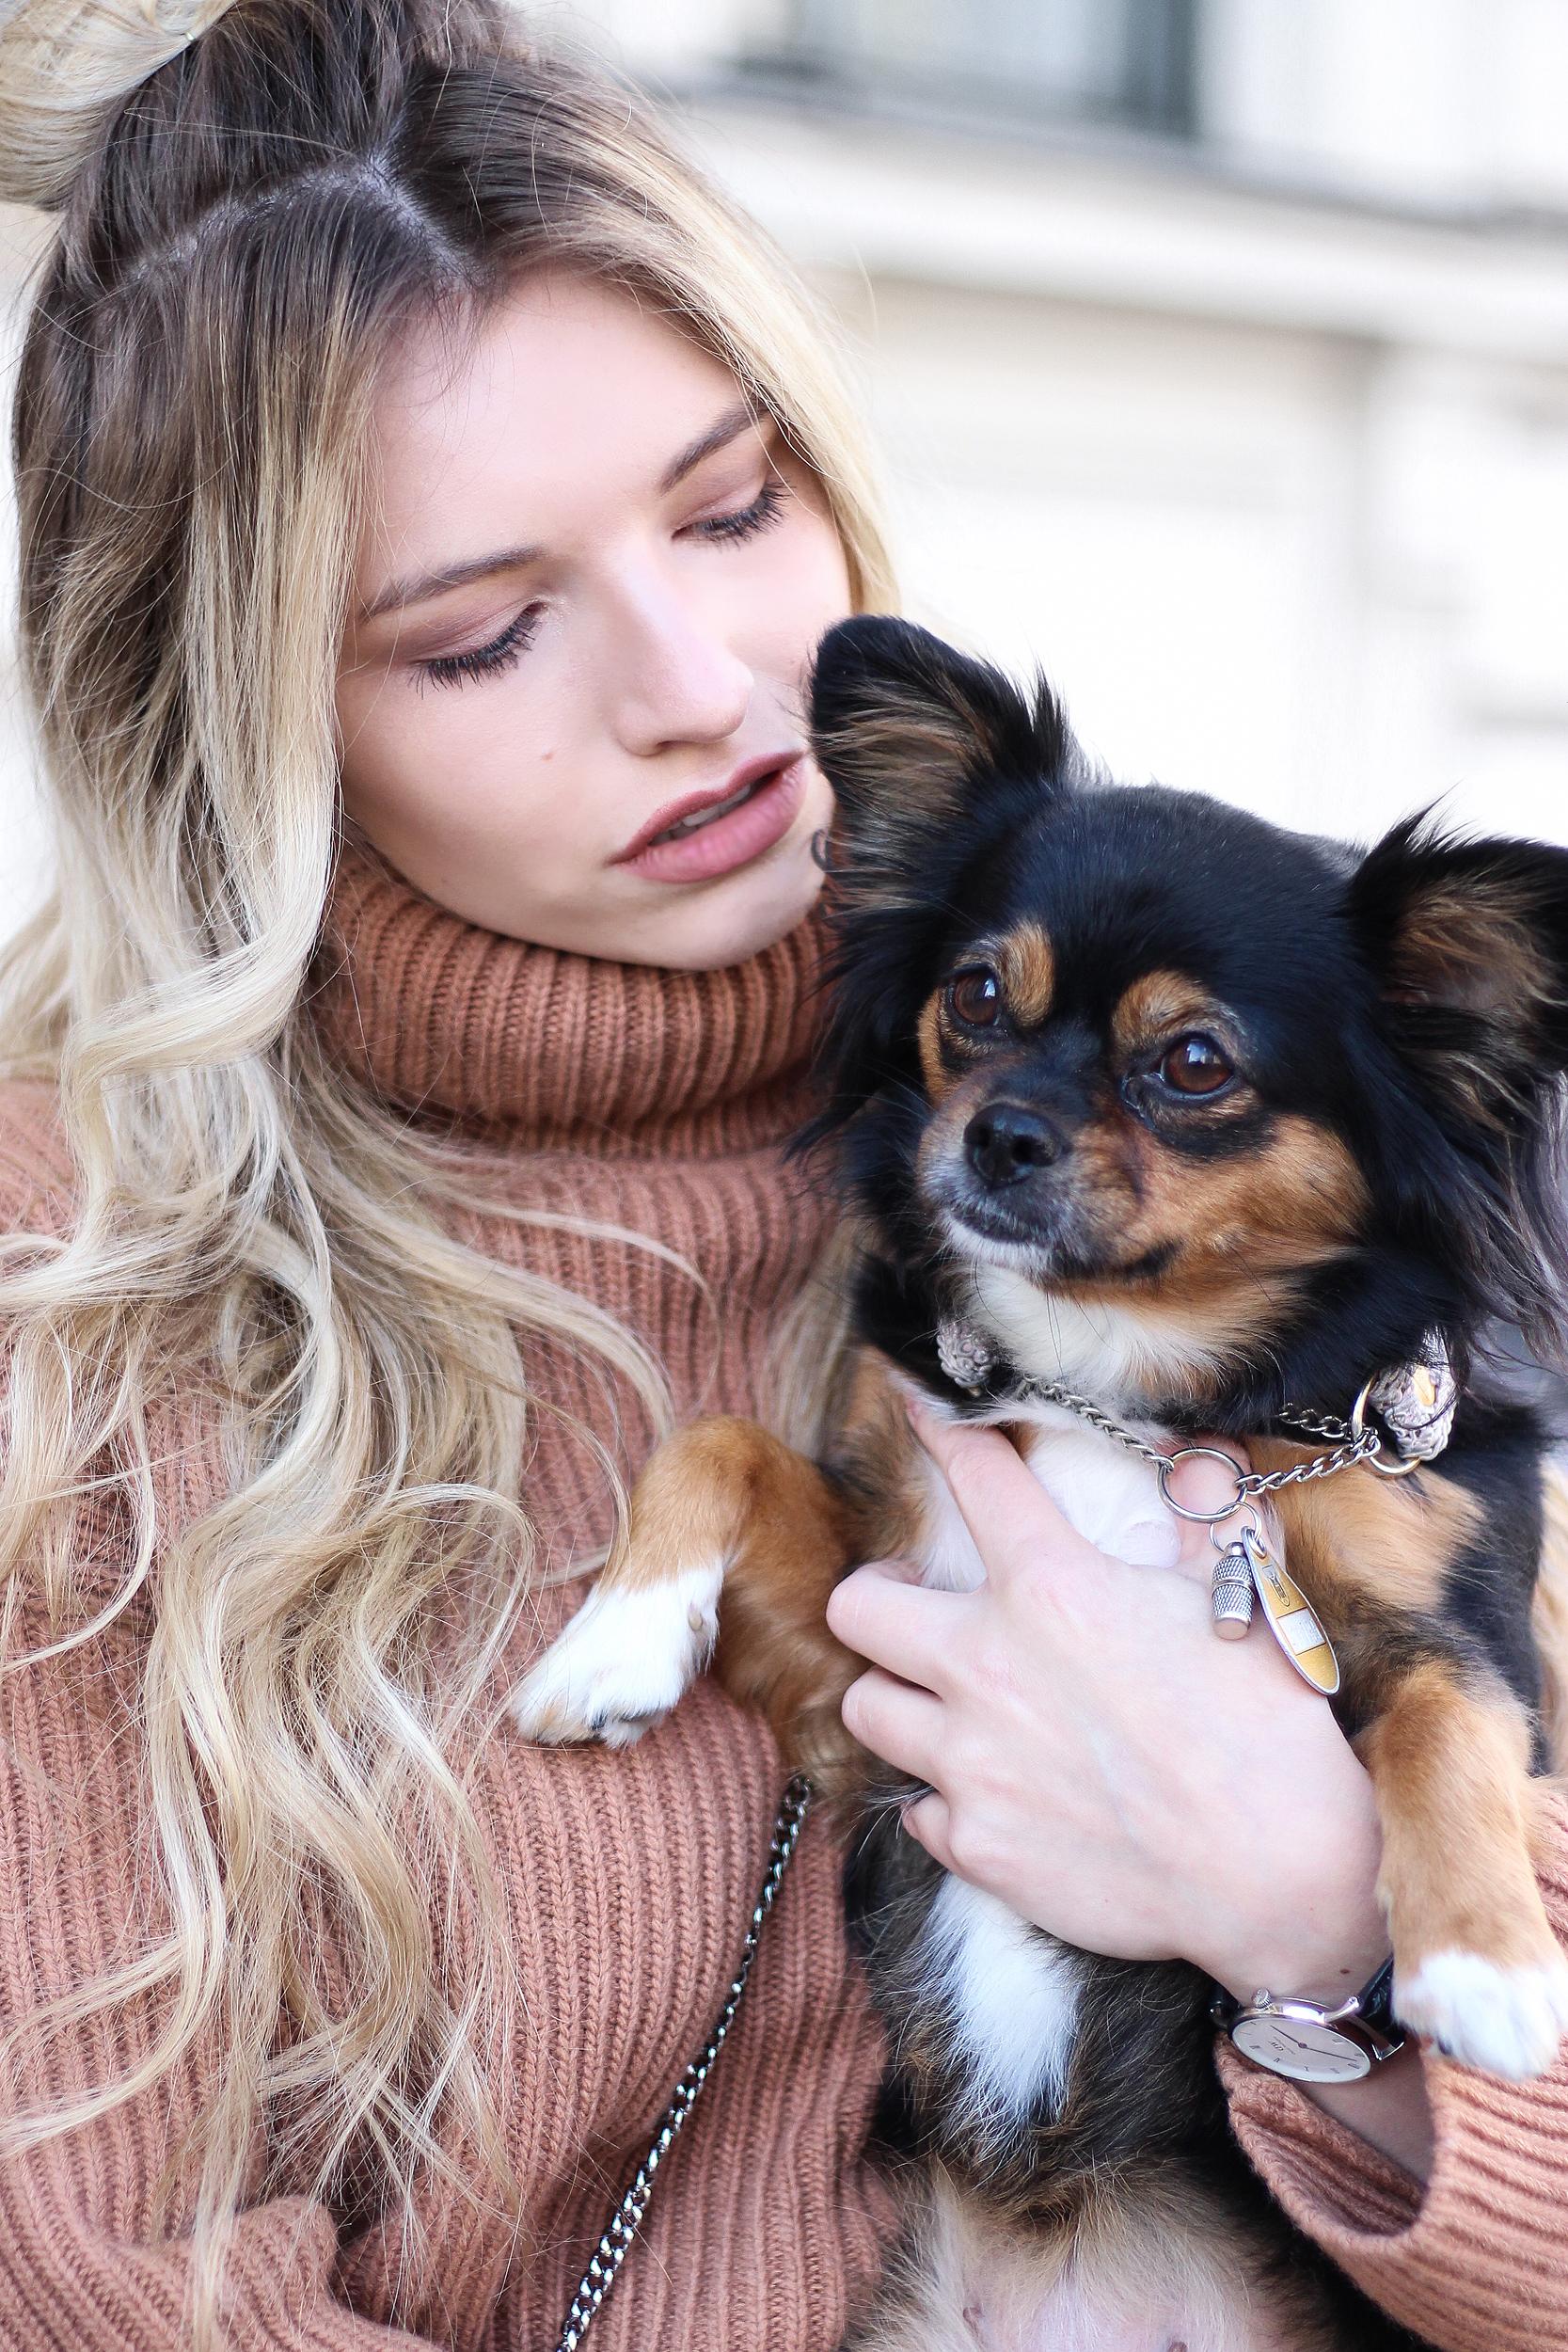 franziska-elea-blogger-aus-muenchen-fashionblog-mini-rock-fashionblogger-rollkragen-pullover-brauner-pullover-strick-grobstrick-hund-chihuahua-mix